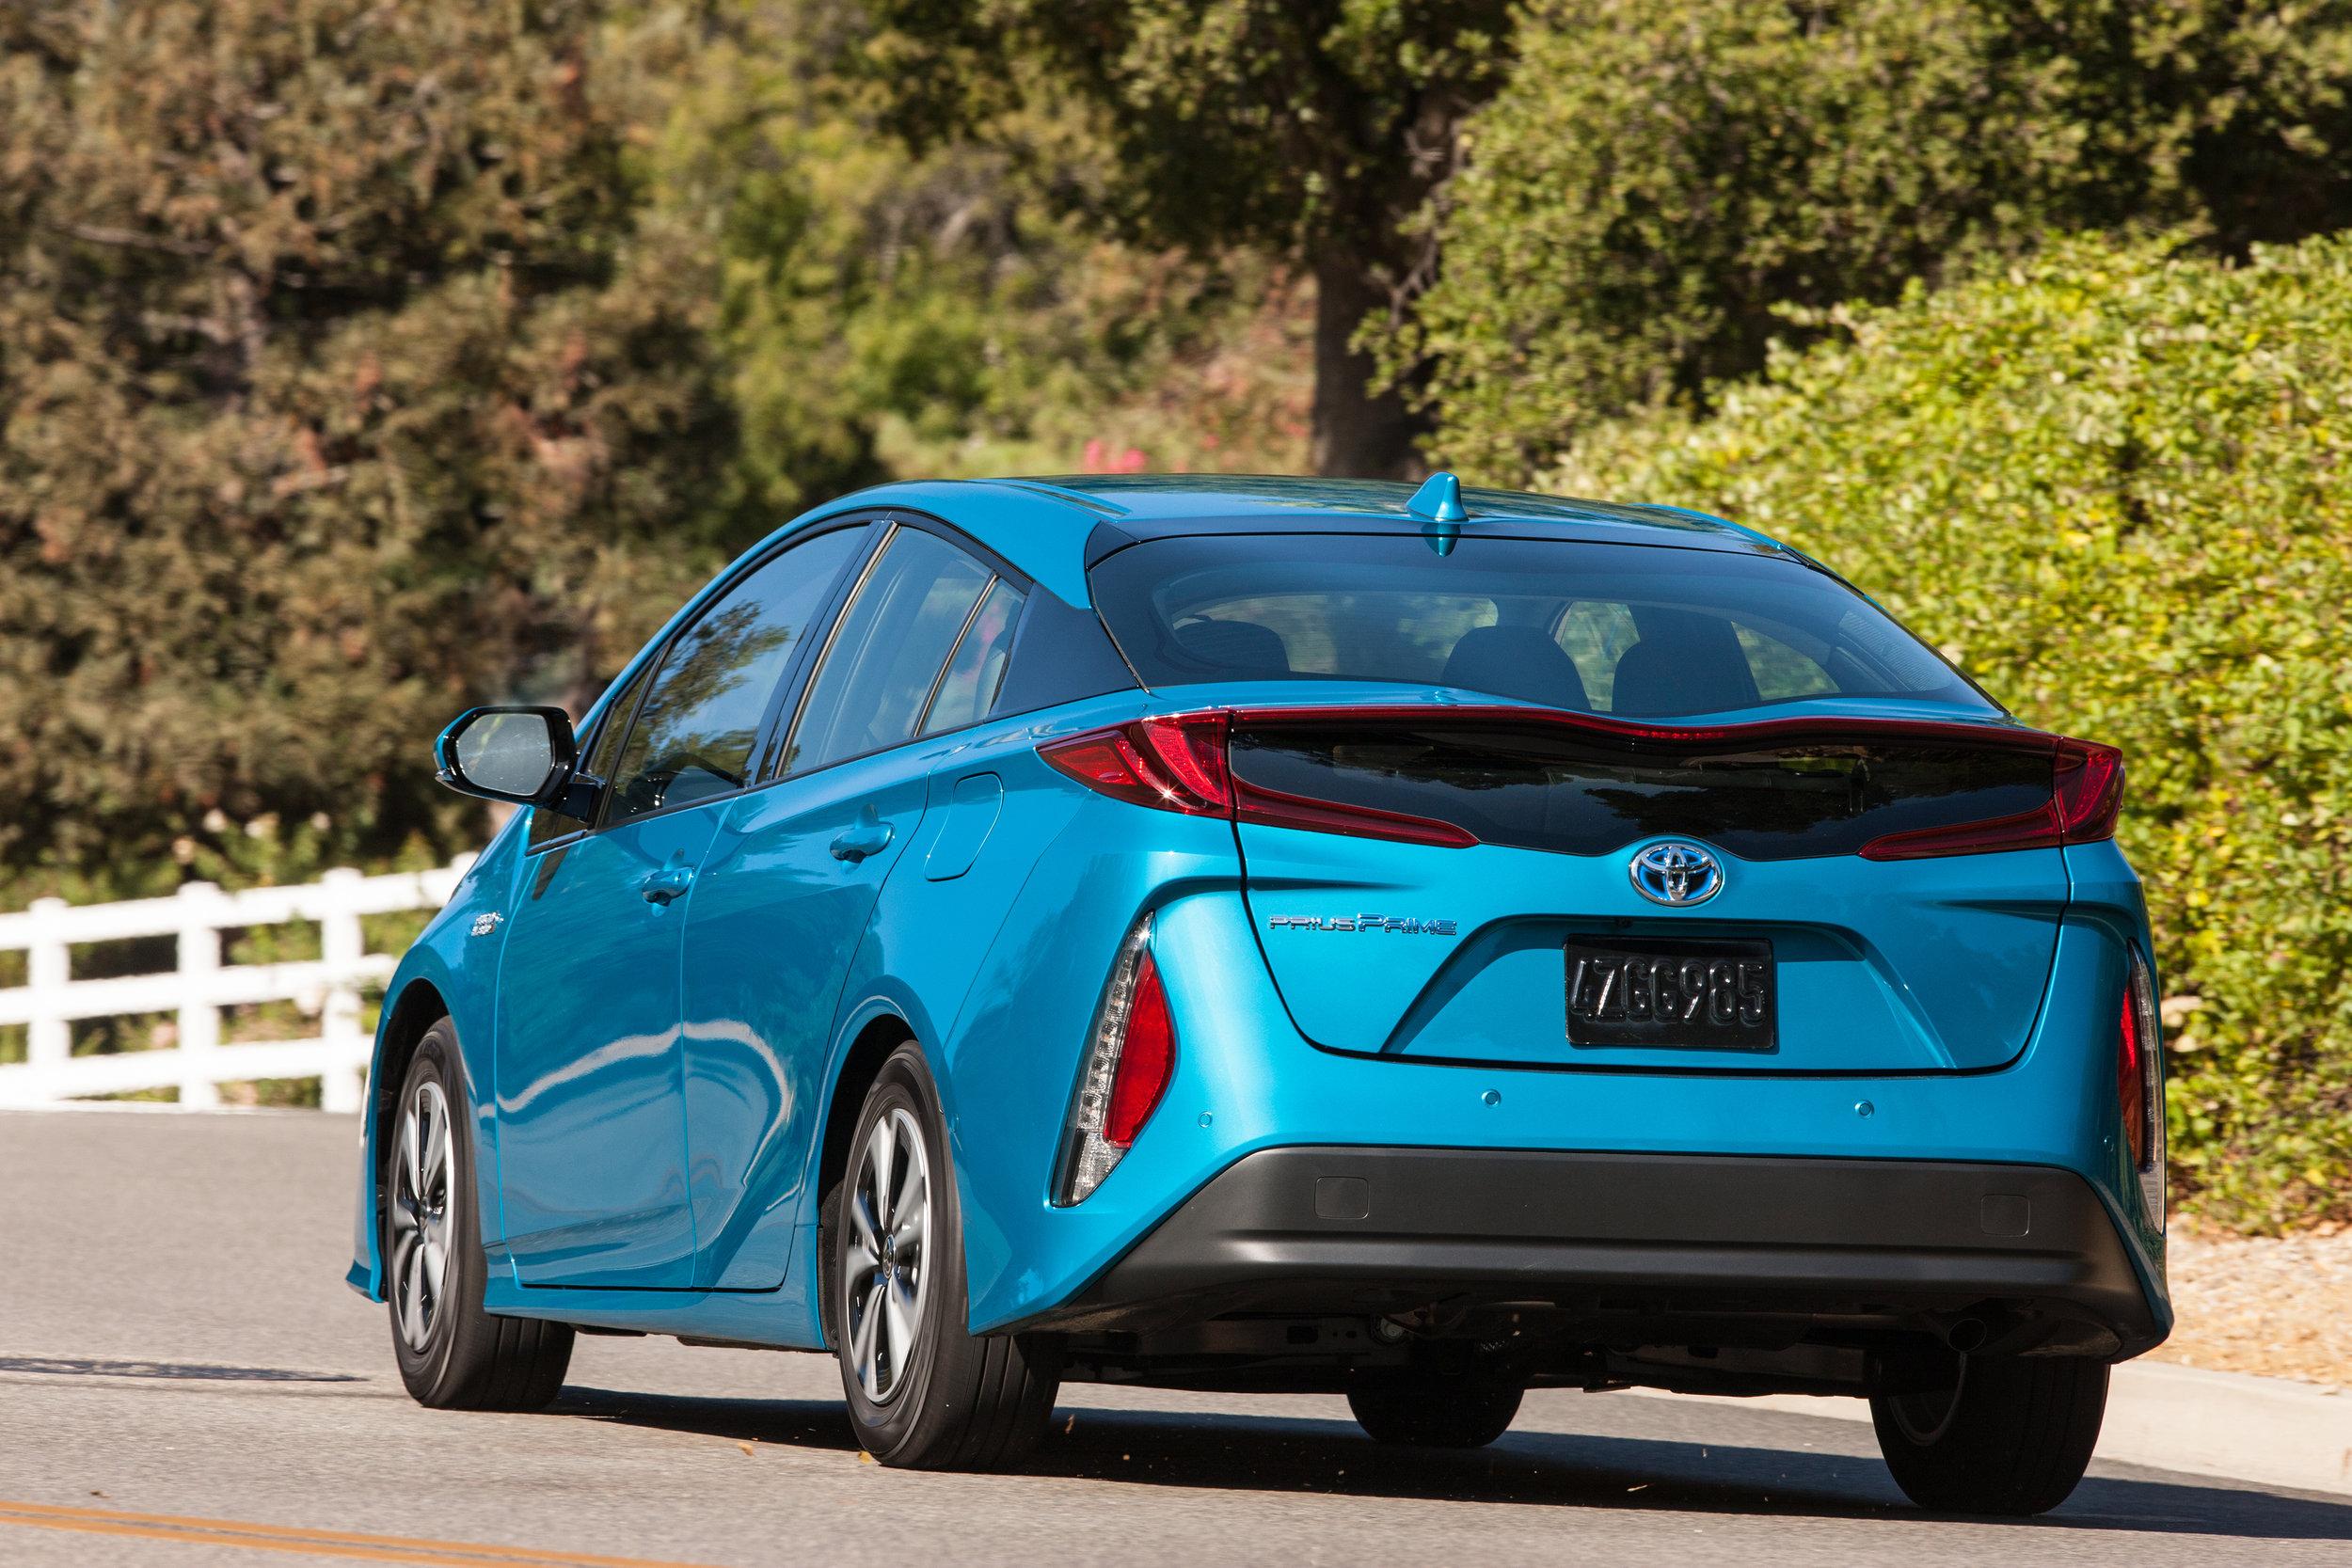 2017_Toyota_Prius_Prime_Advanced_005_BA1AFD551F4C922254B2760A2E452DBCA702D5E4.jpg